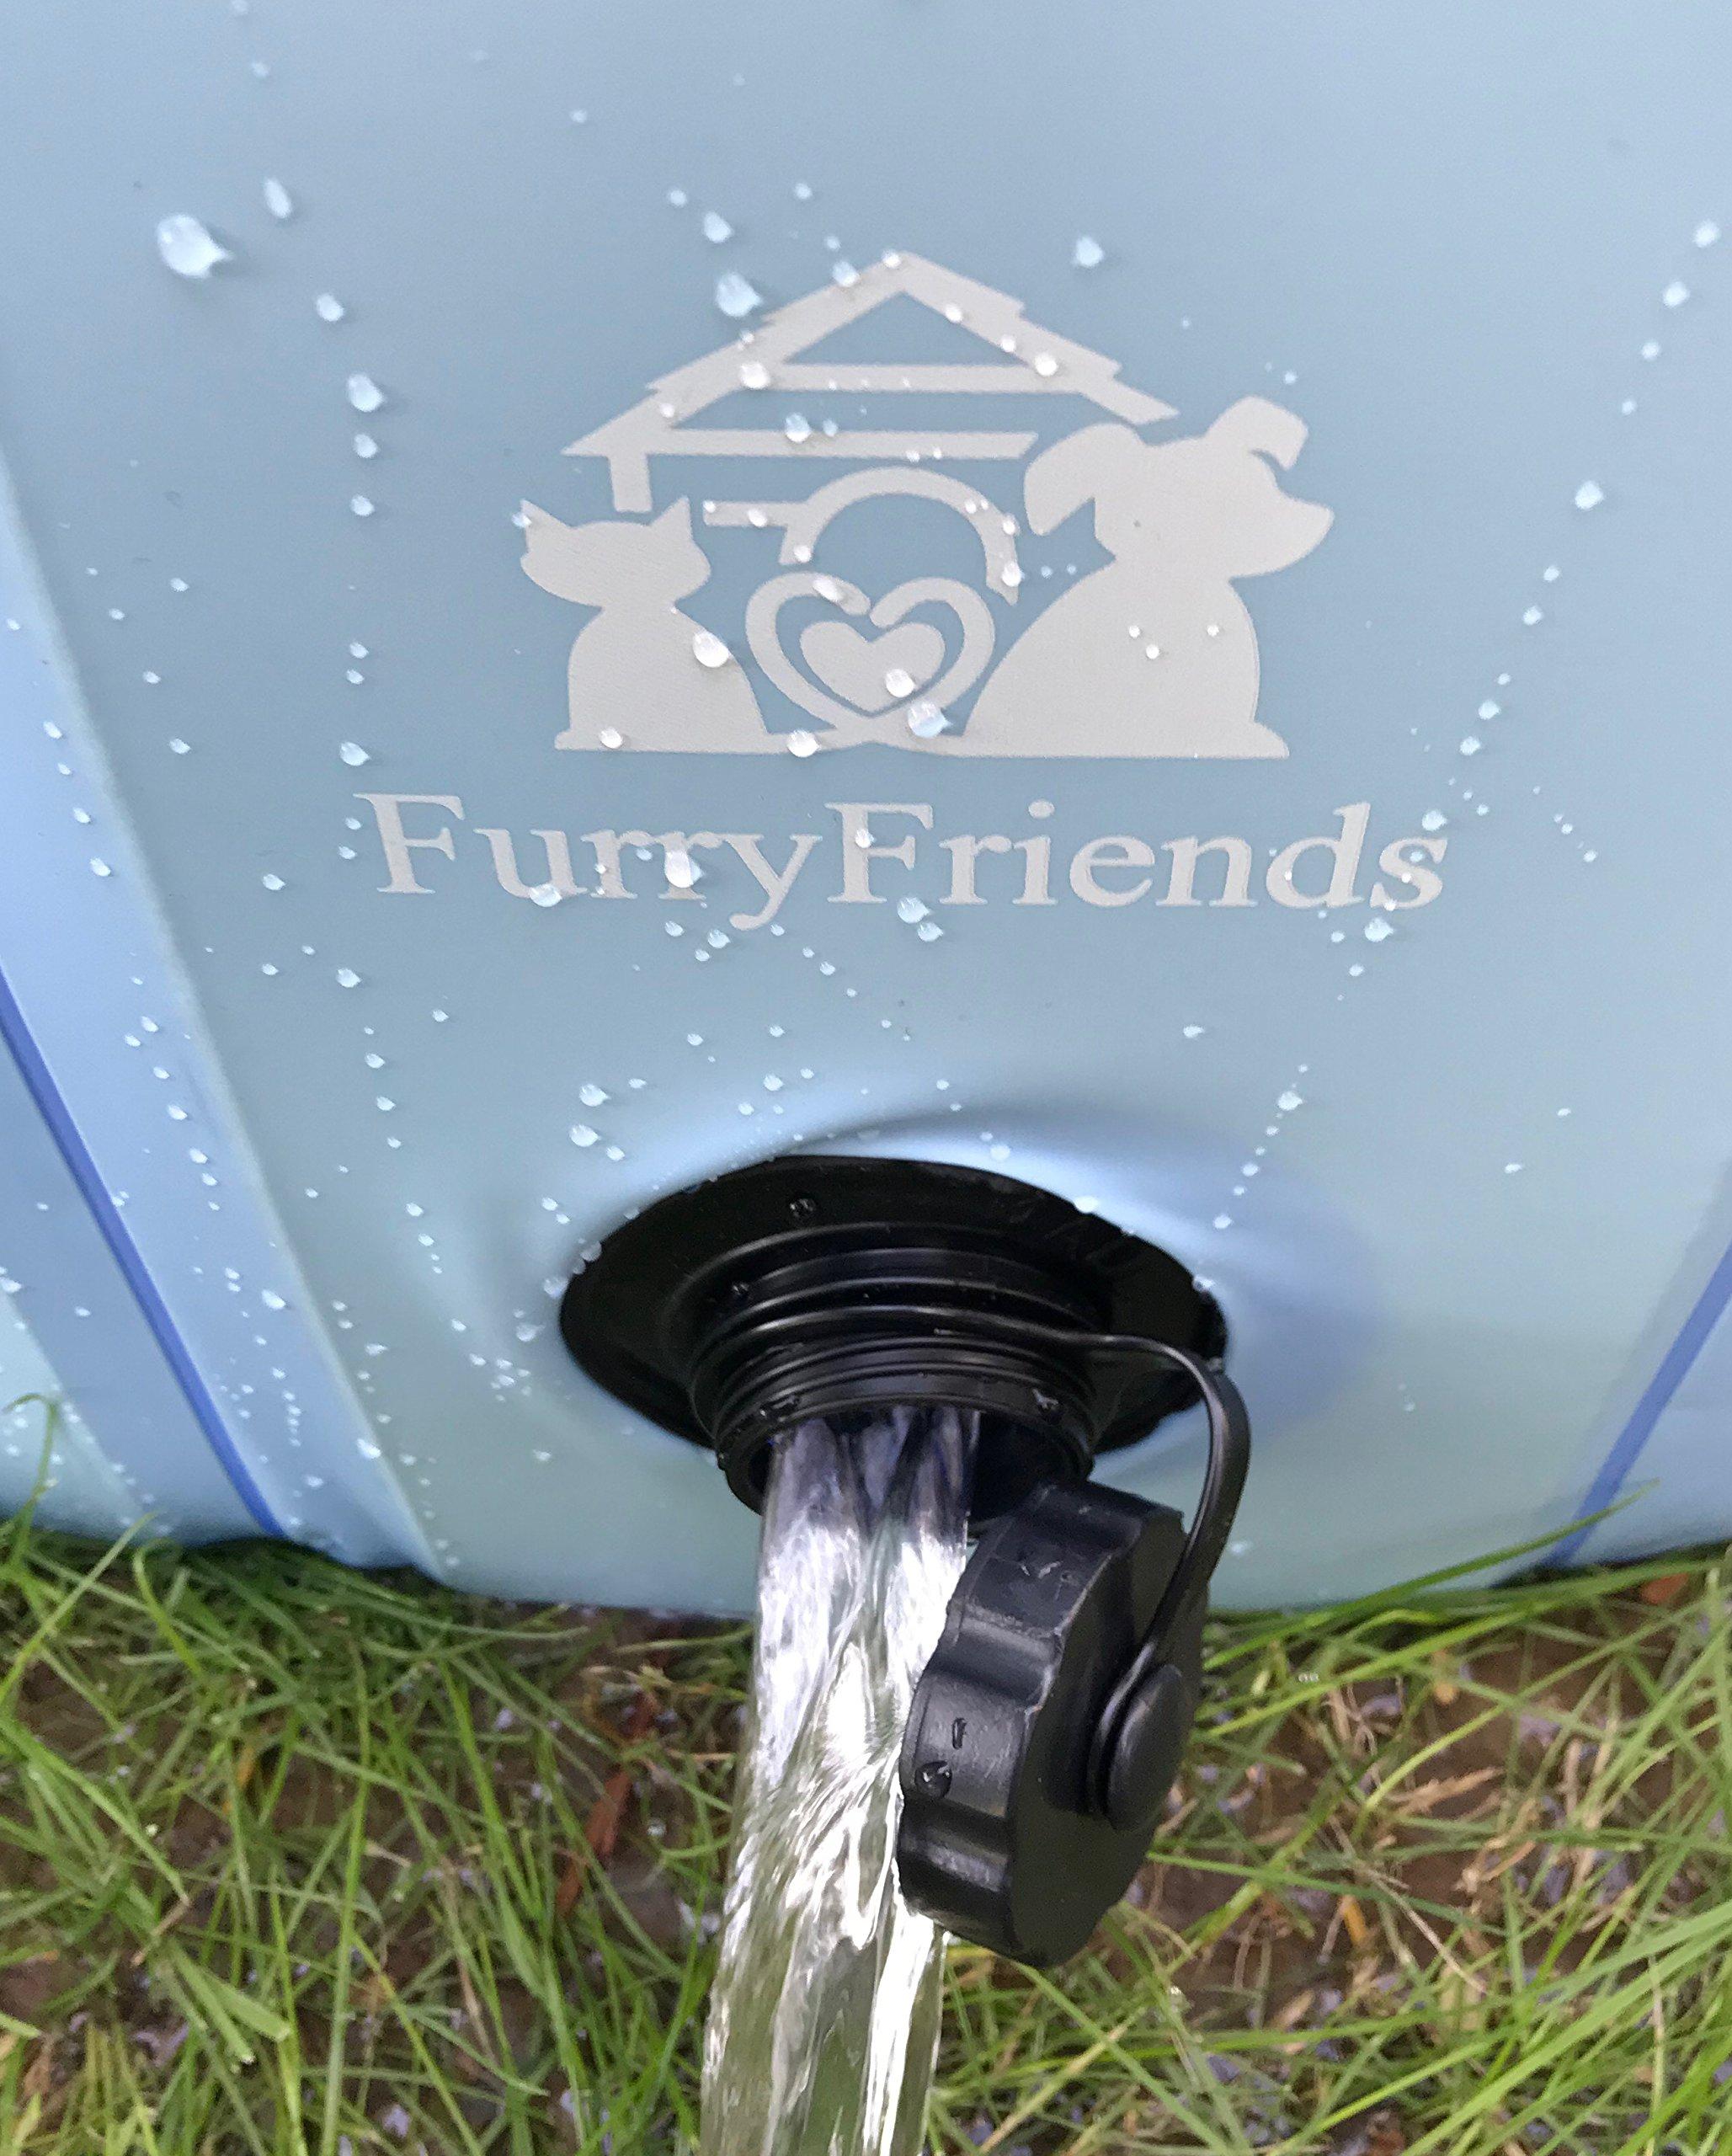 FurryFriends Foldable Dog Pool - Folding Dog / Cat Bath Tub - Collapsible Pet Spa - Large (50''x12'') - Blue